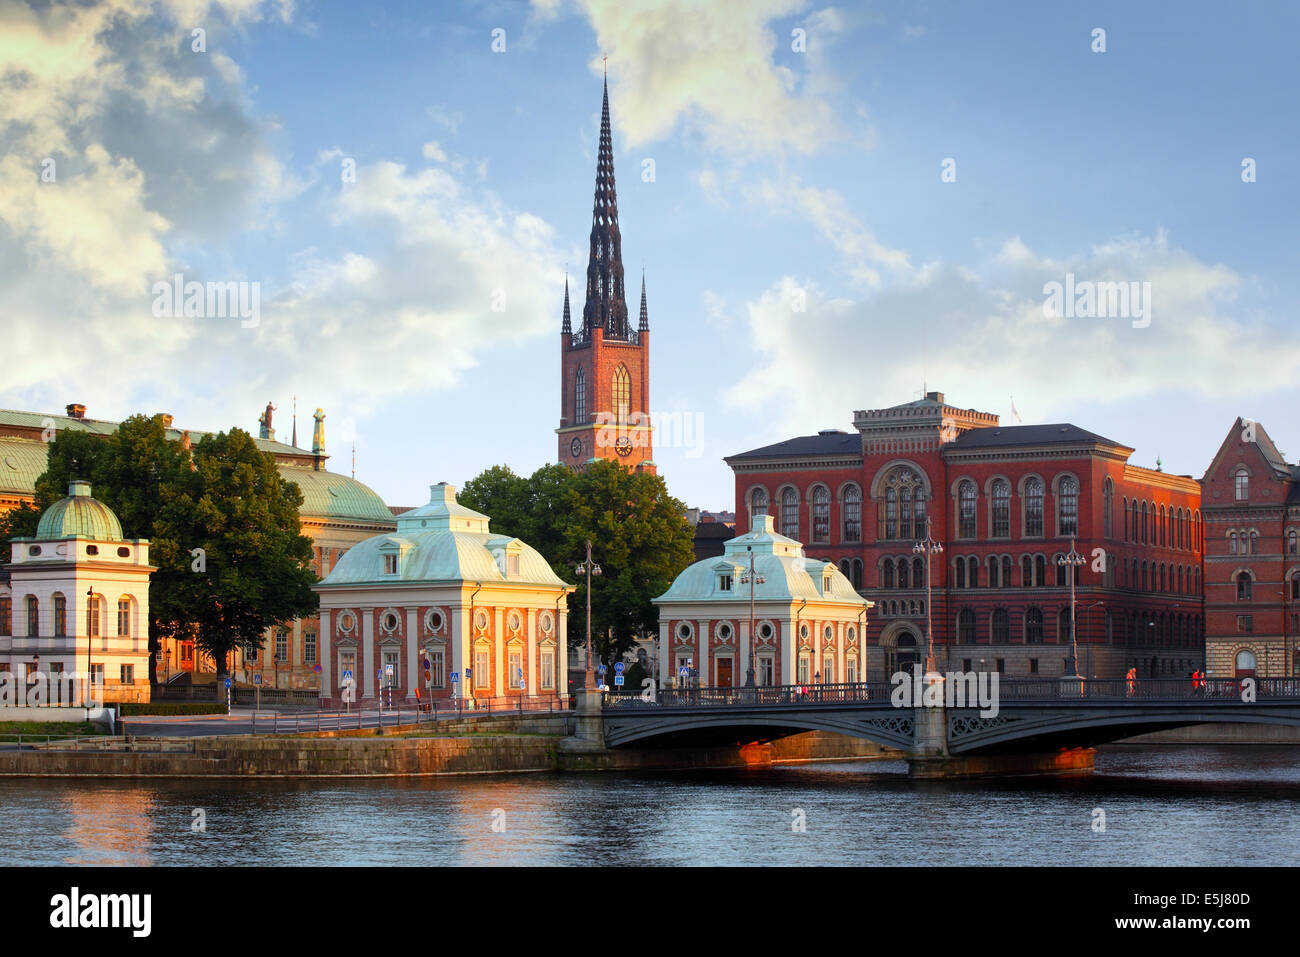 Stockholm City - Stock Image